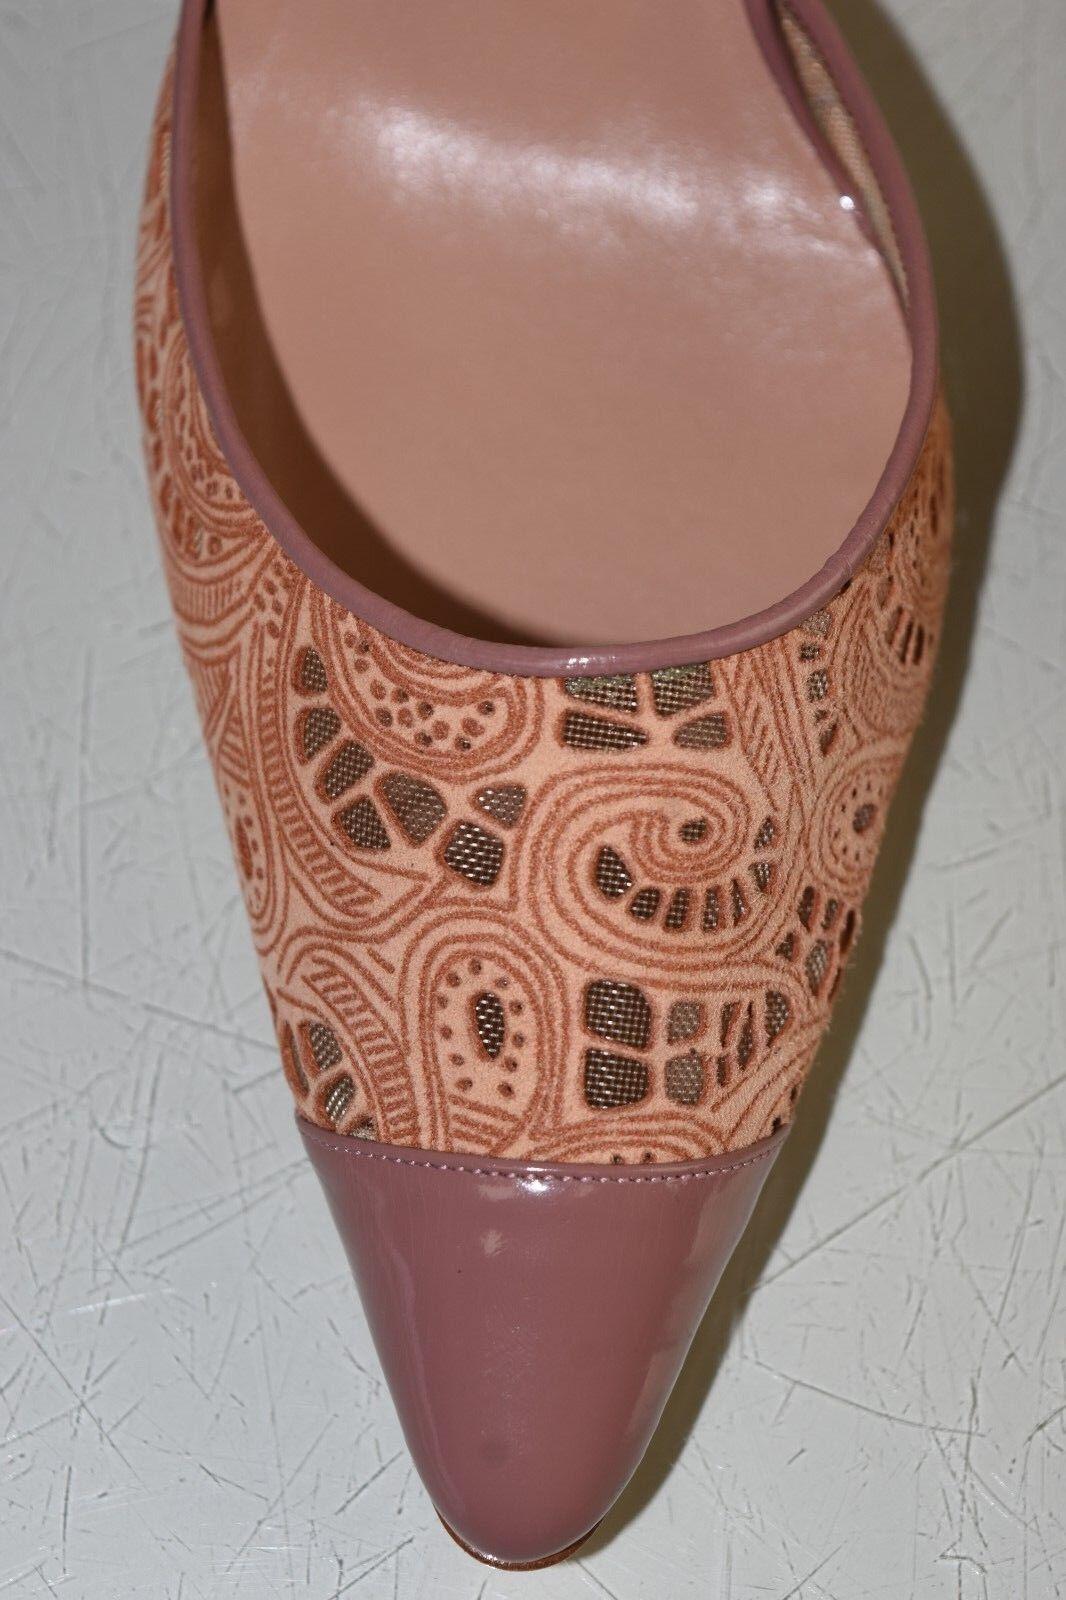 Neuf Neuf Neuf Manolo Blahnik Tayler Chair Beige Laser Cuir Suédé Chaussures Verni 40.5 fba061